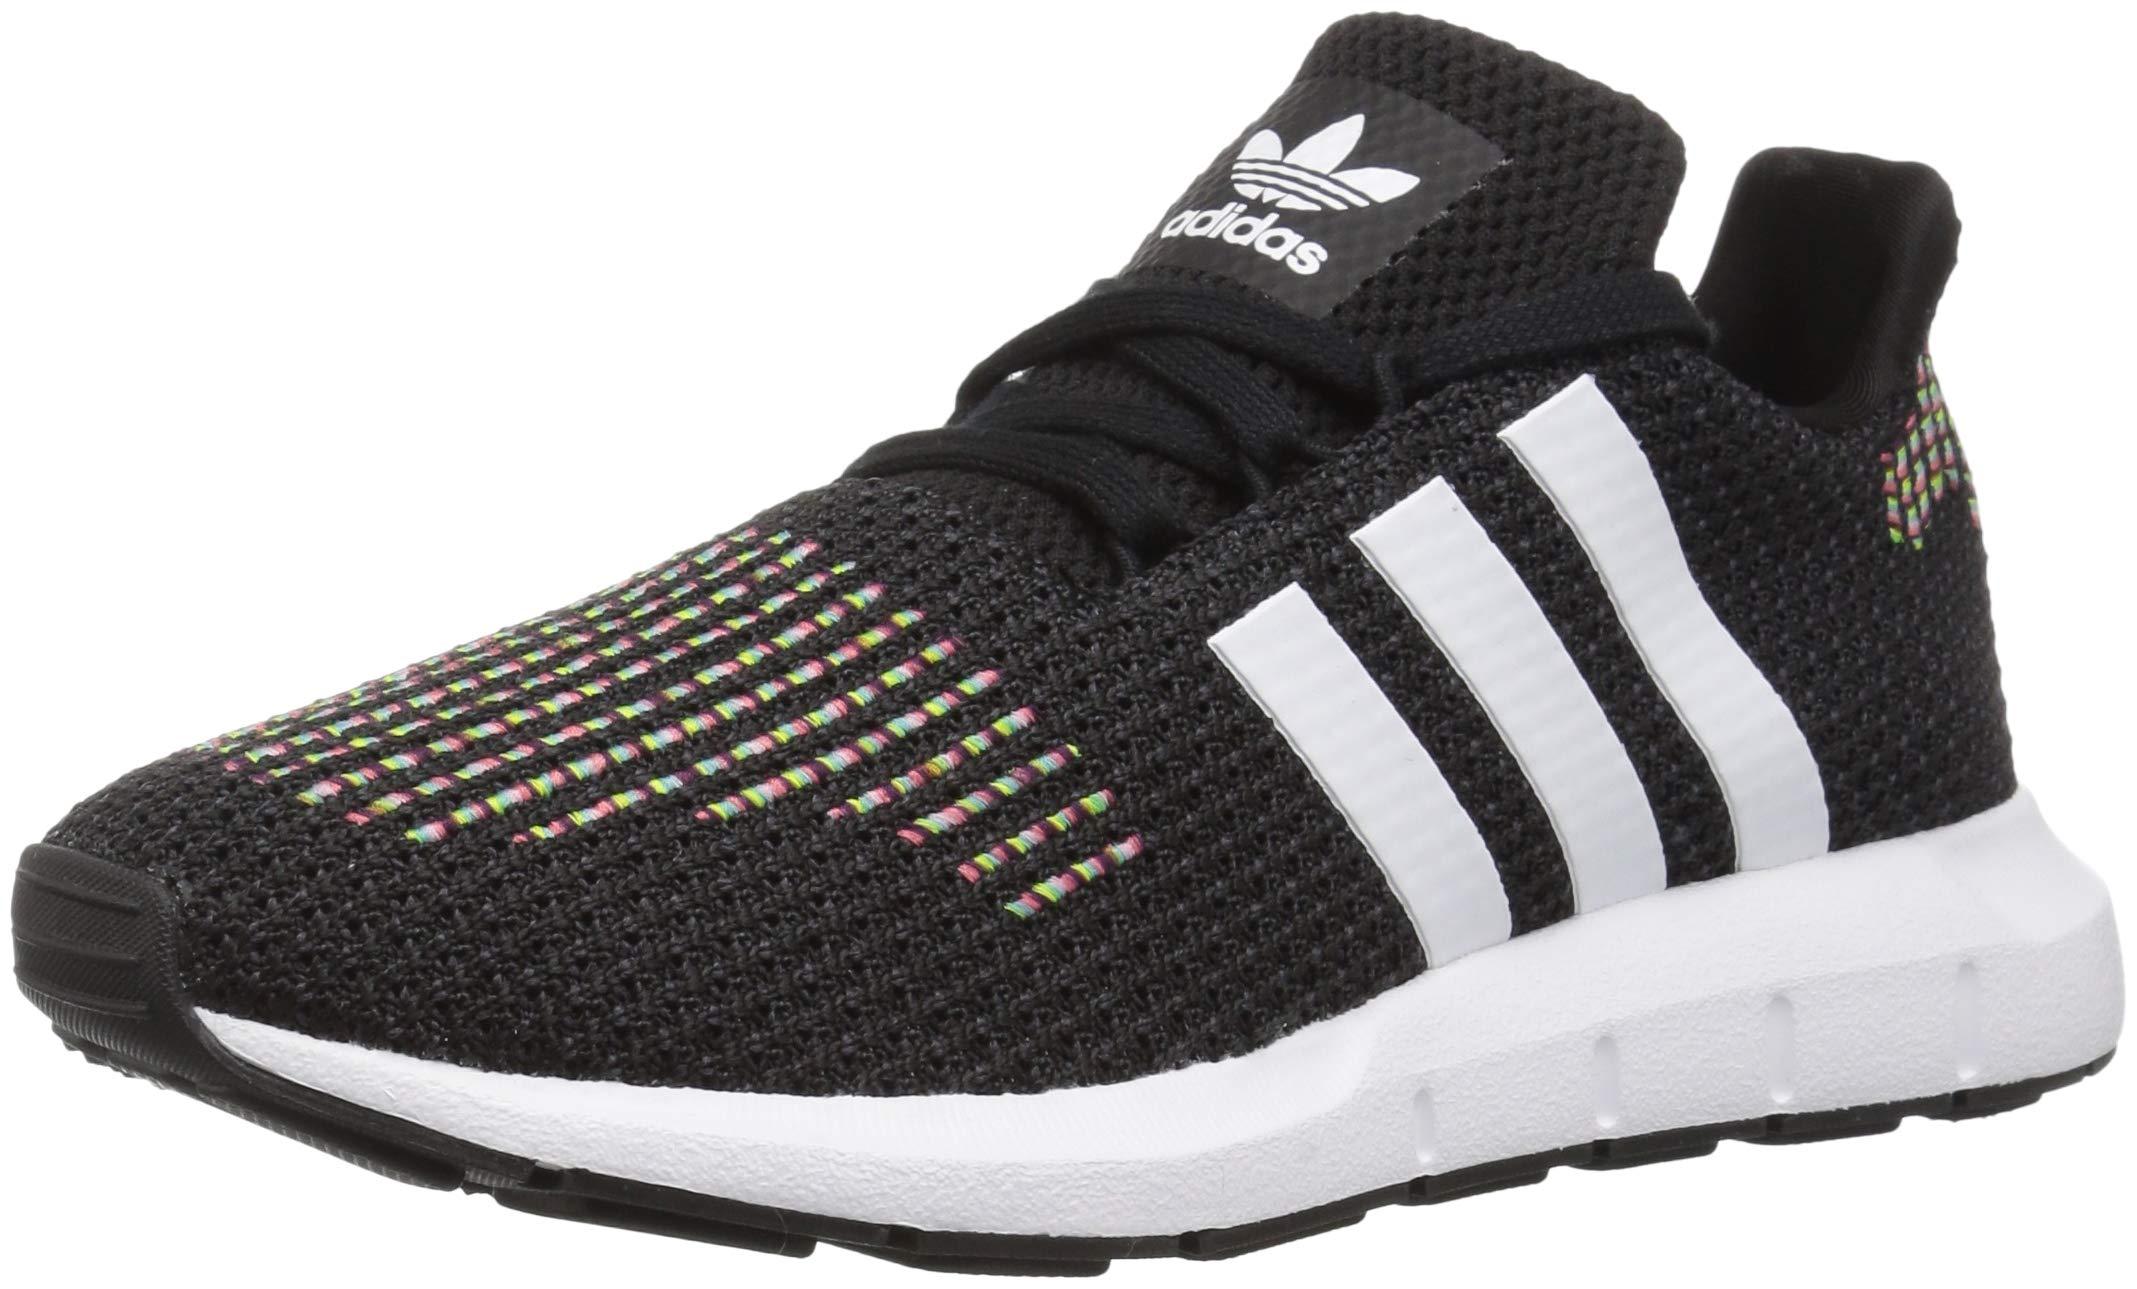 adidas Originals Women's Swift W Running-Shoes,core black/white/core black,8.5 M US